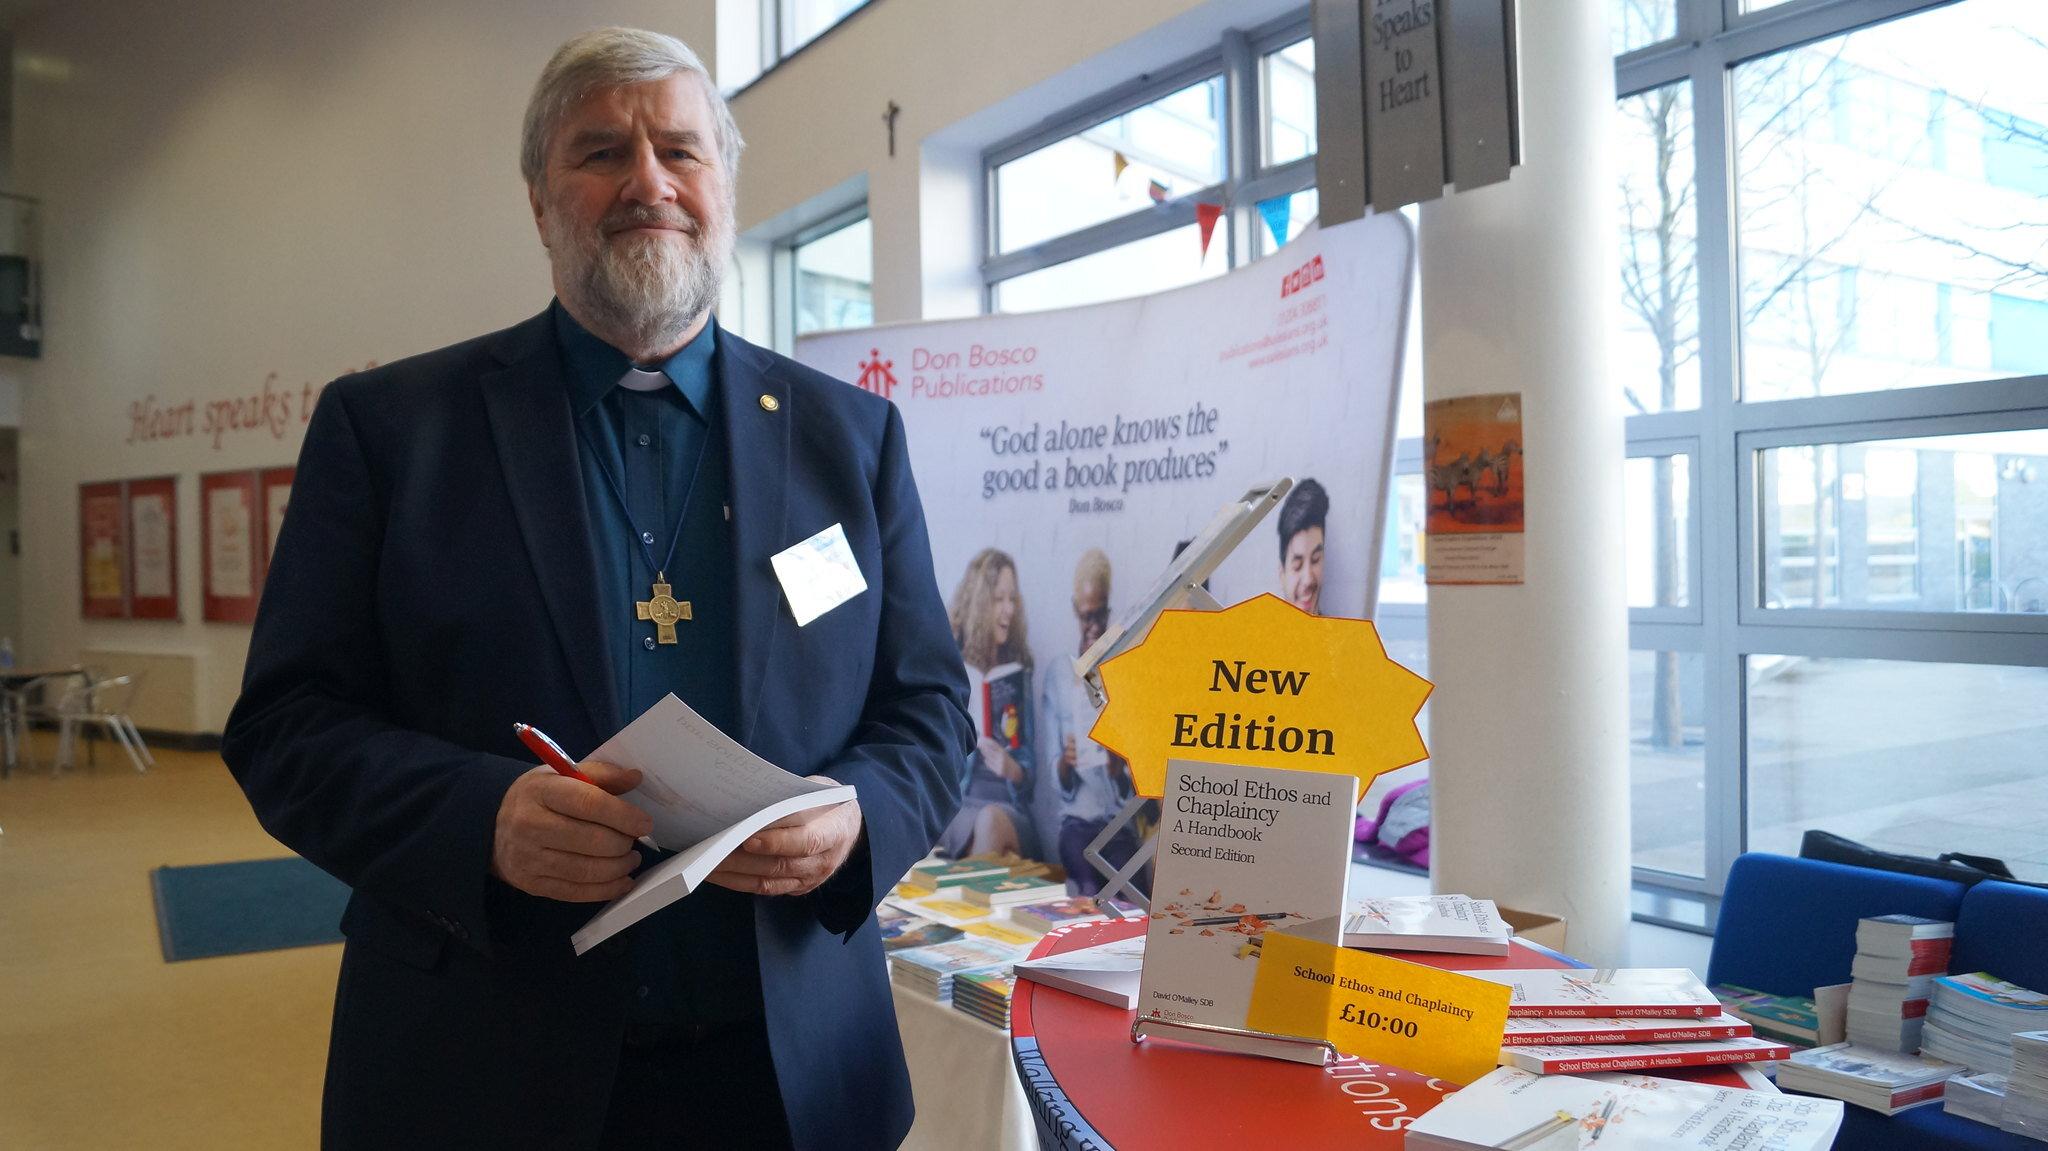 Fr David at 2019 Salesian Schools Conference, image: Salesian Link (Salesians GB)